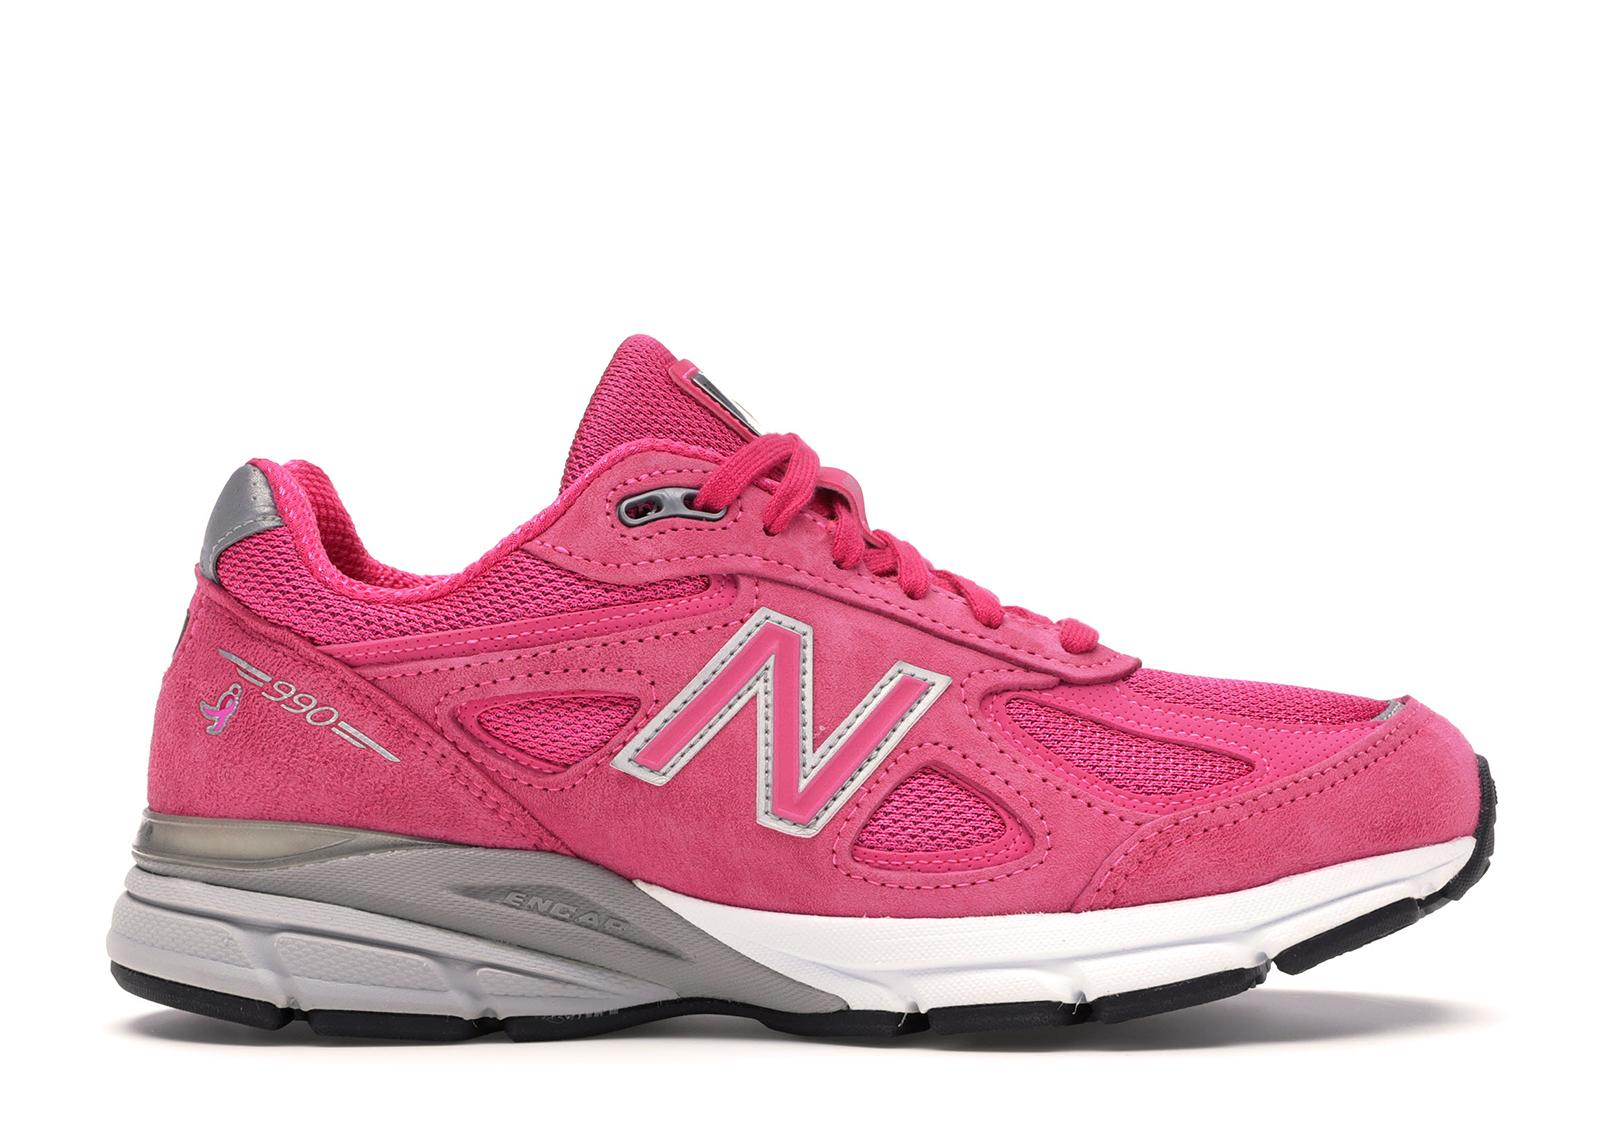 New Balance 990v4 Pink Ribbon Komen